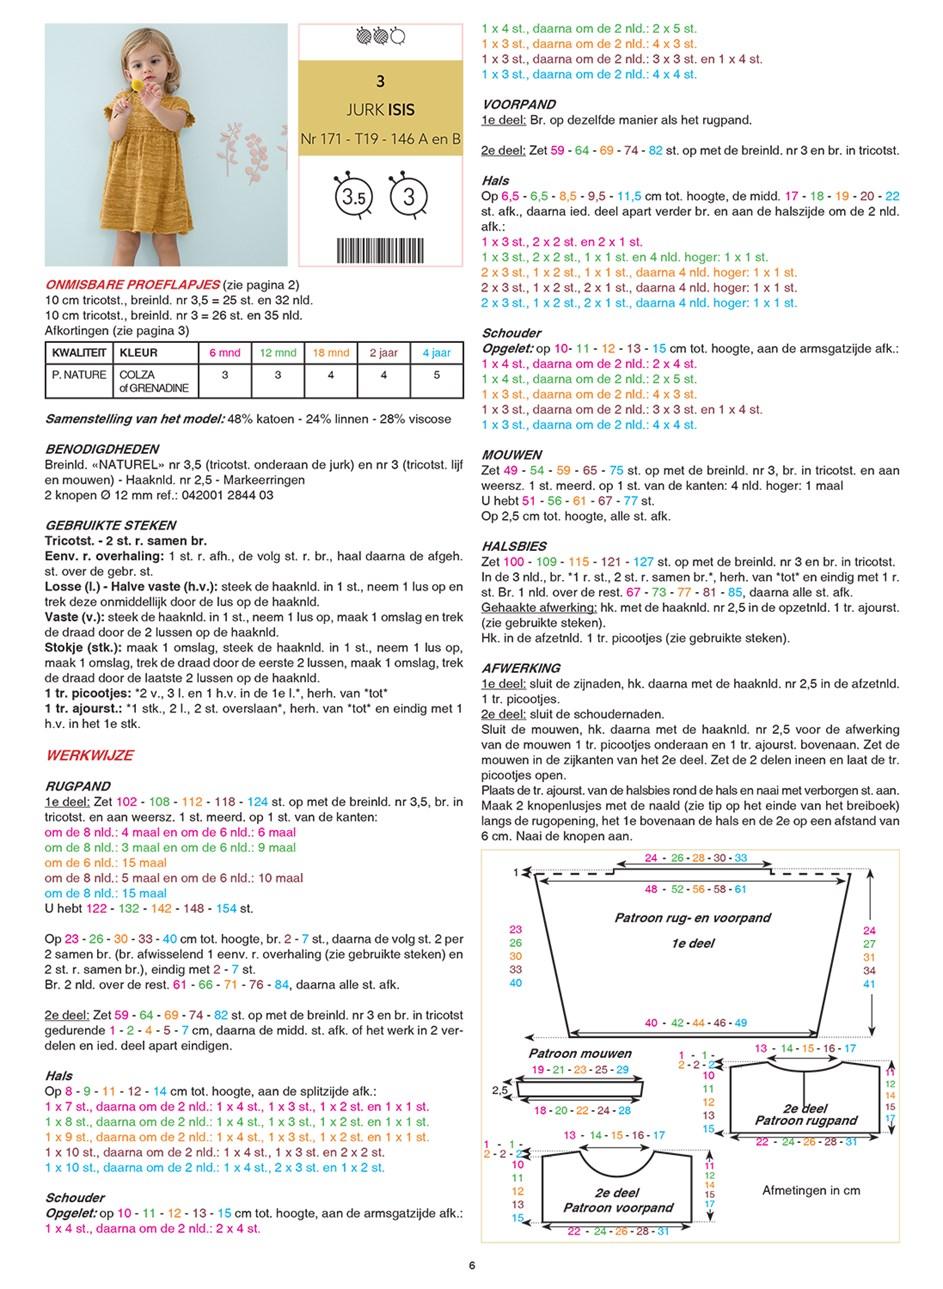 Gratis patroon - Breipatroon jurkje